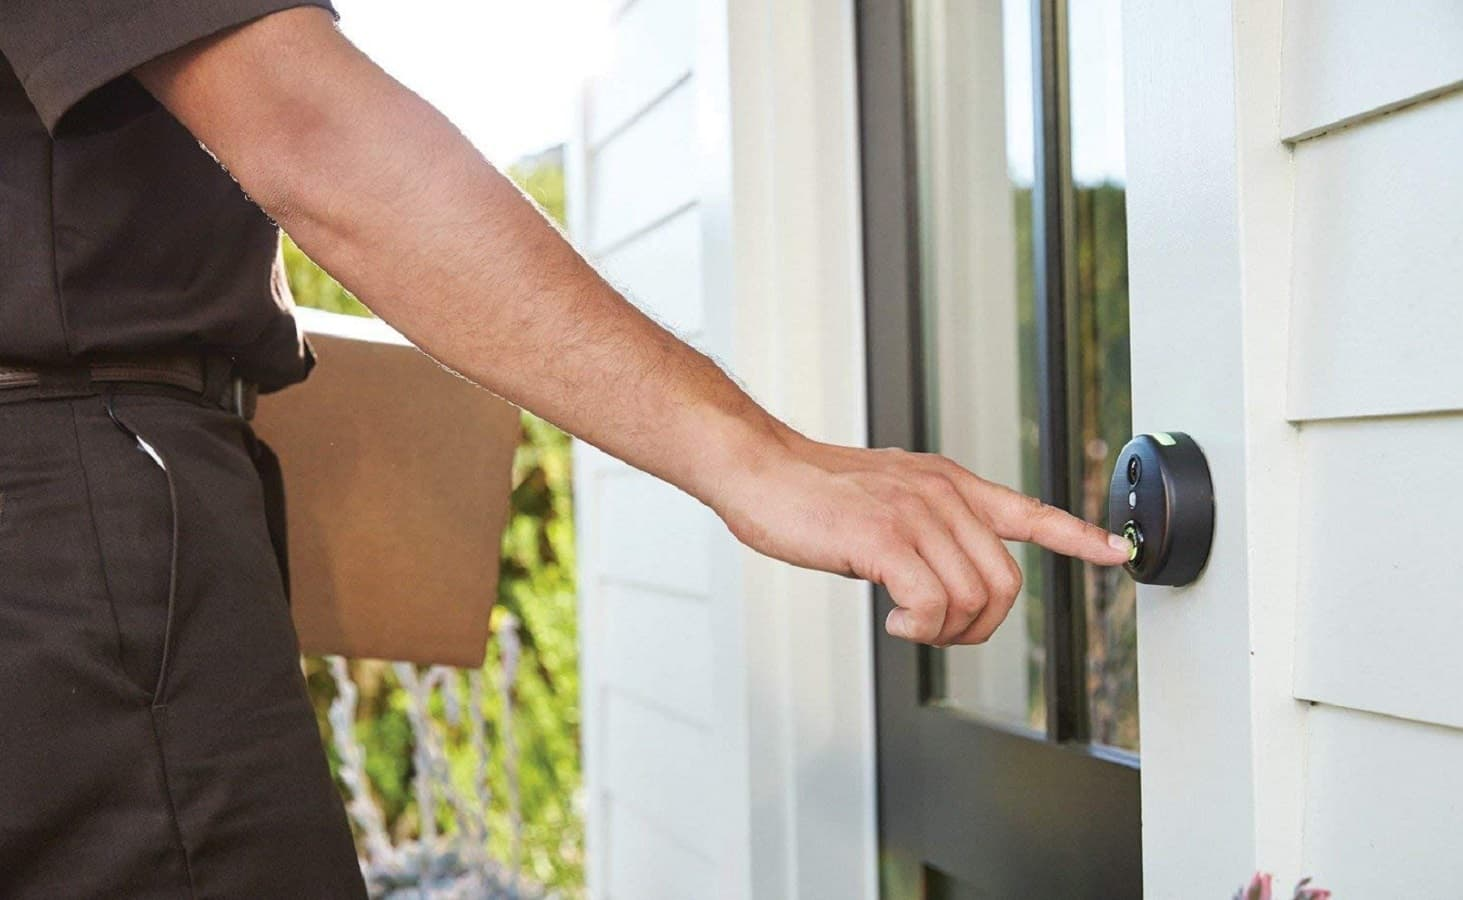 skybell doorbell being pressed on doorframe